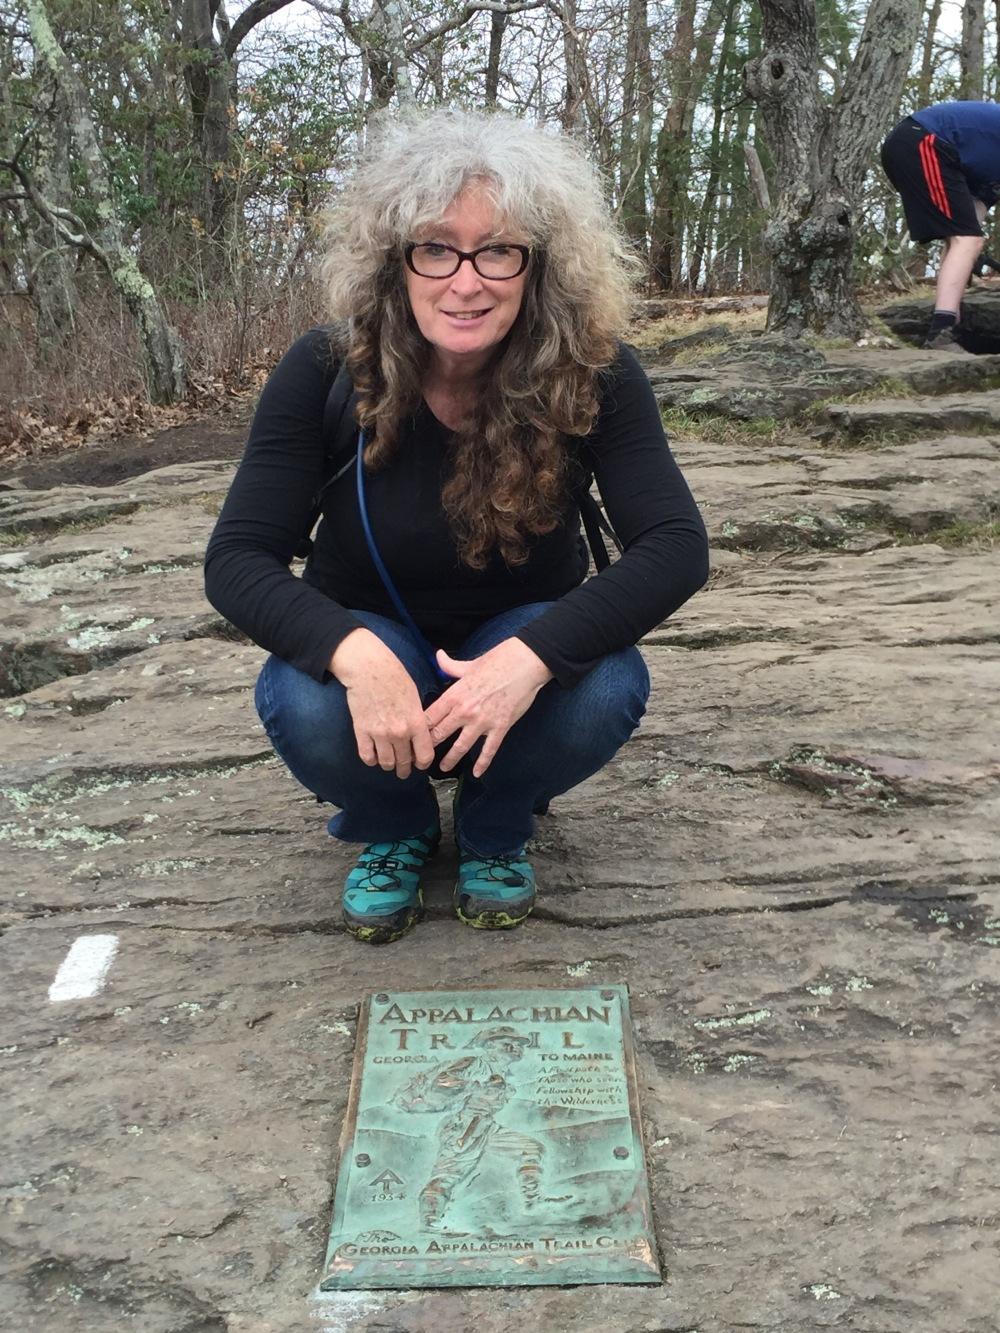 Mandy at AT plaque